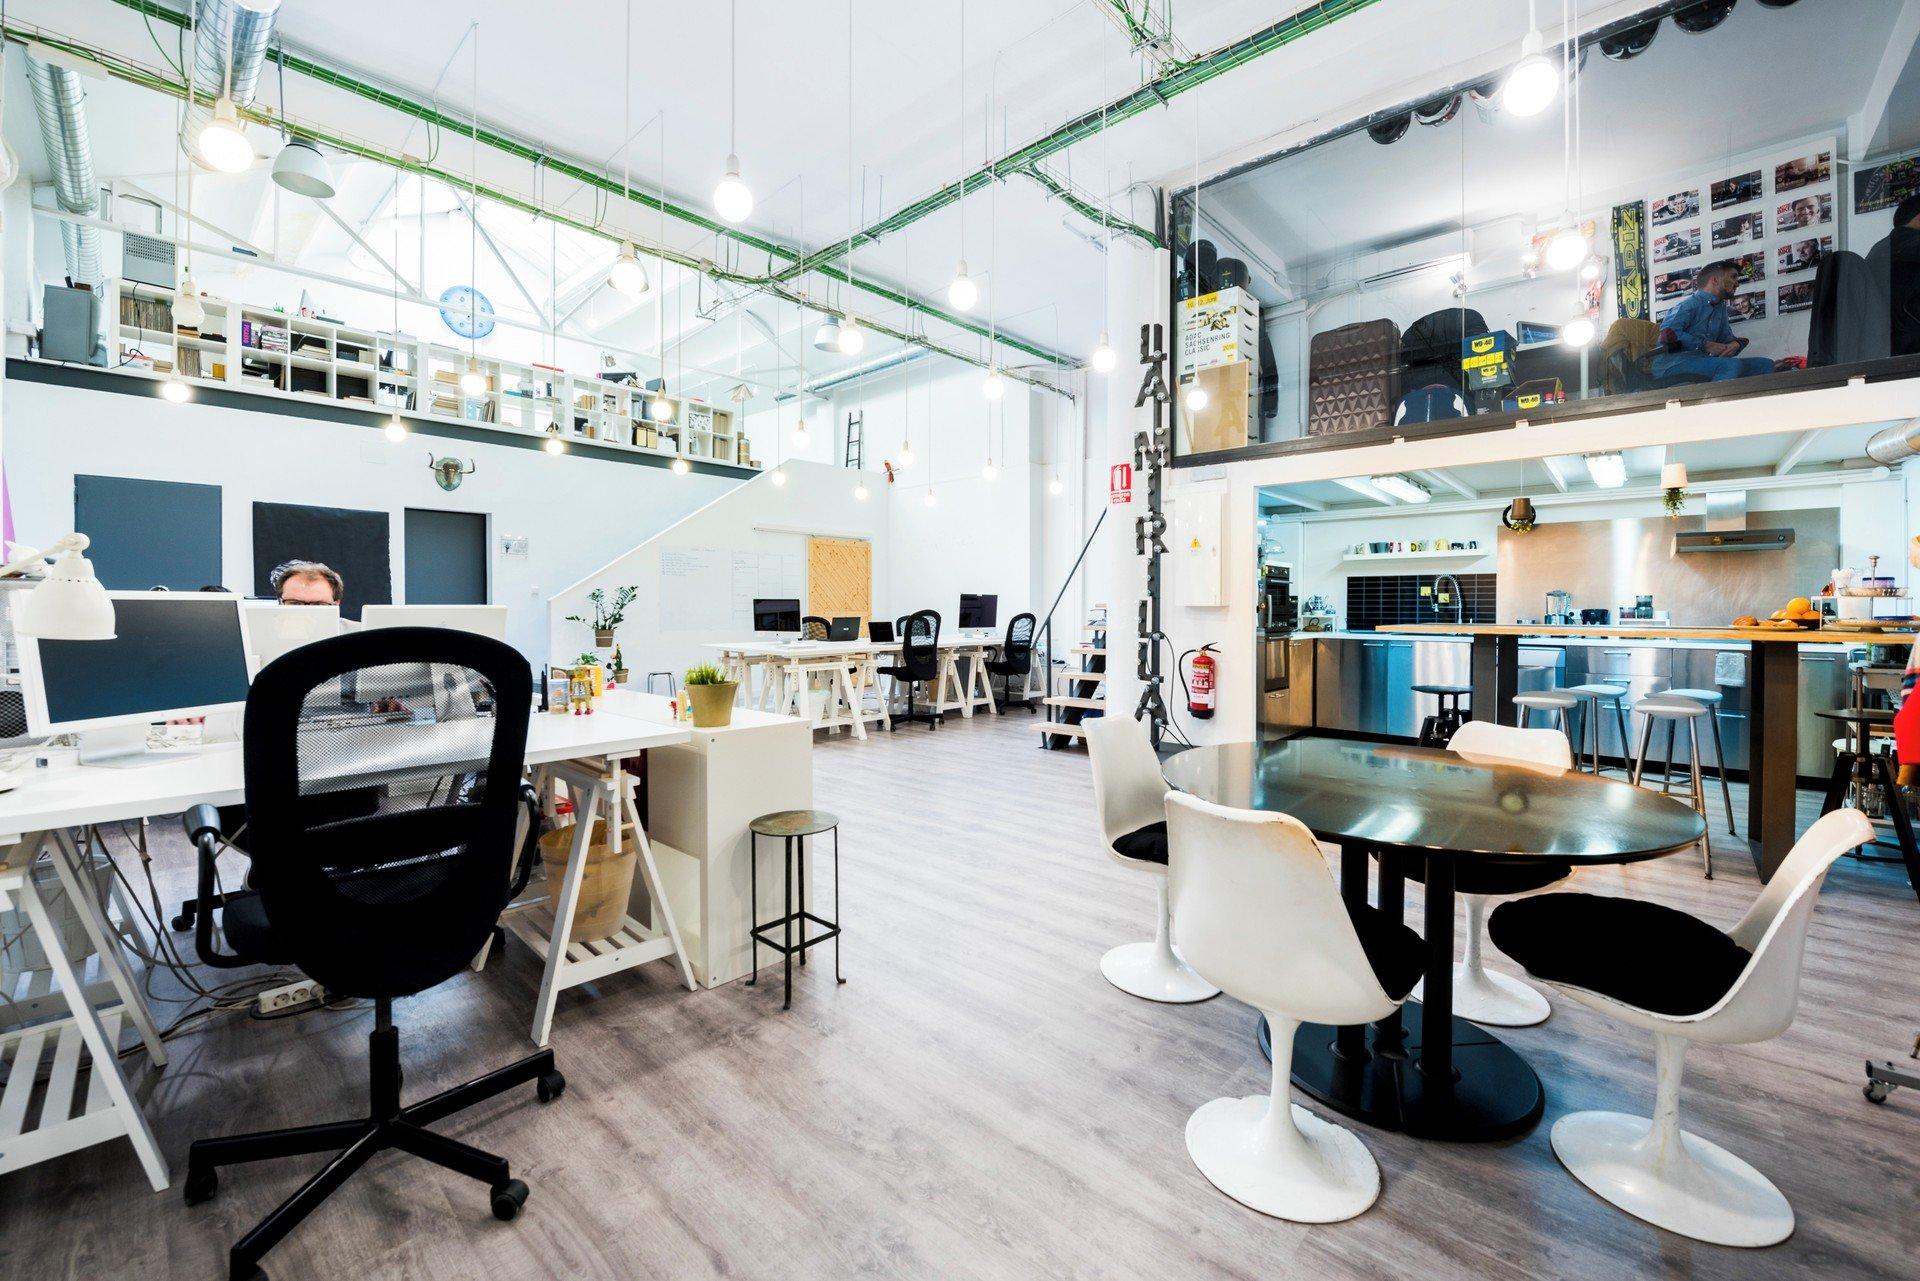 Madrid workshop spaces Lieu industriel Lekanto image 0